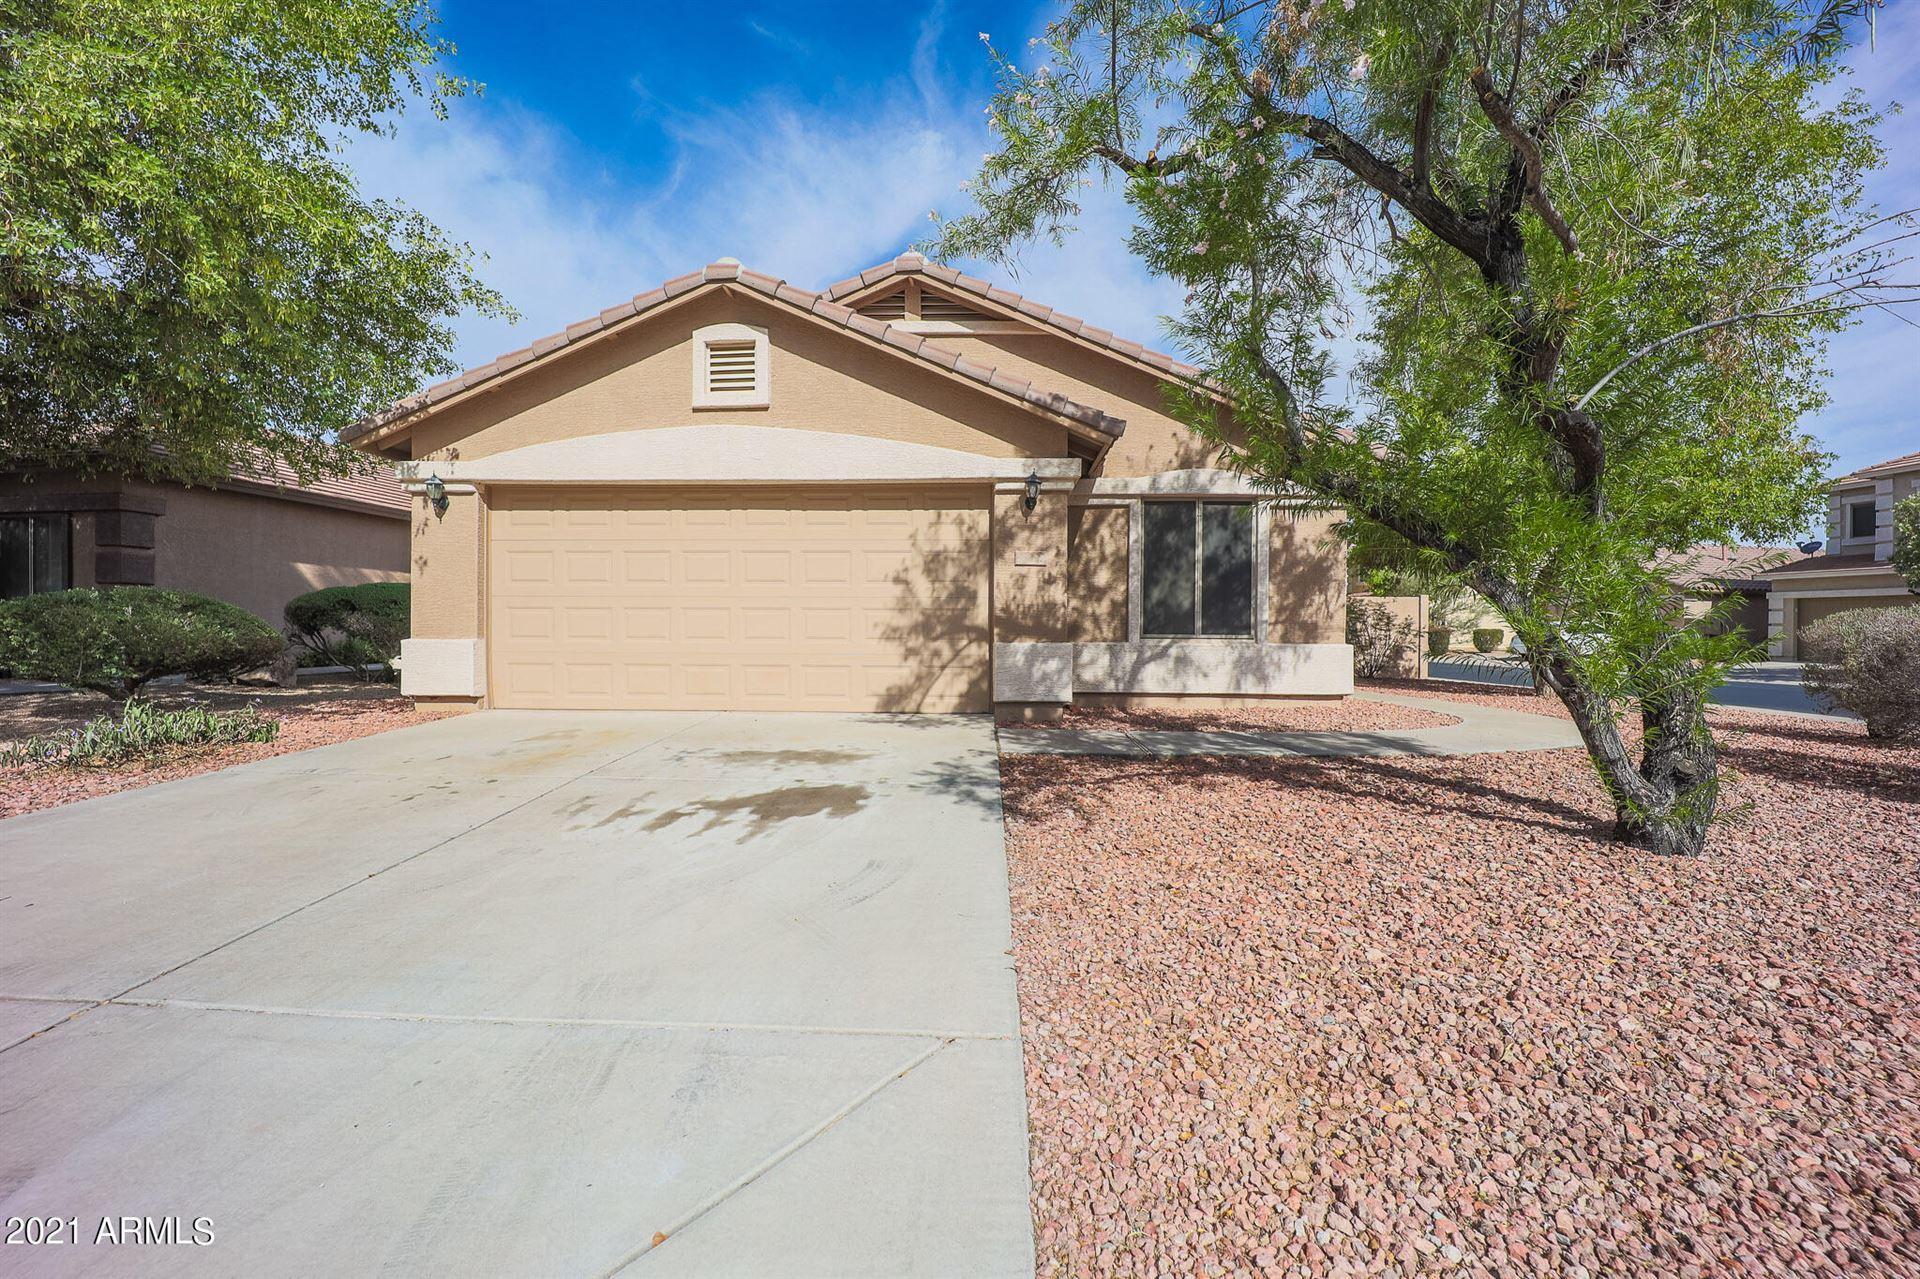 Photo of 13002 W Larkspur Road, El Mirage, AZ 85335 (MLS # 6247572)